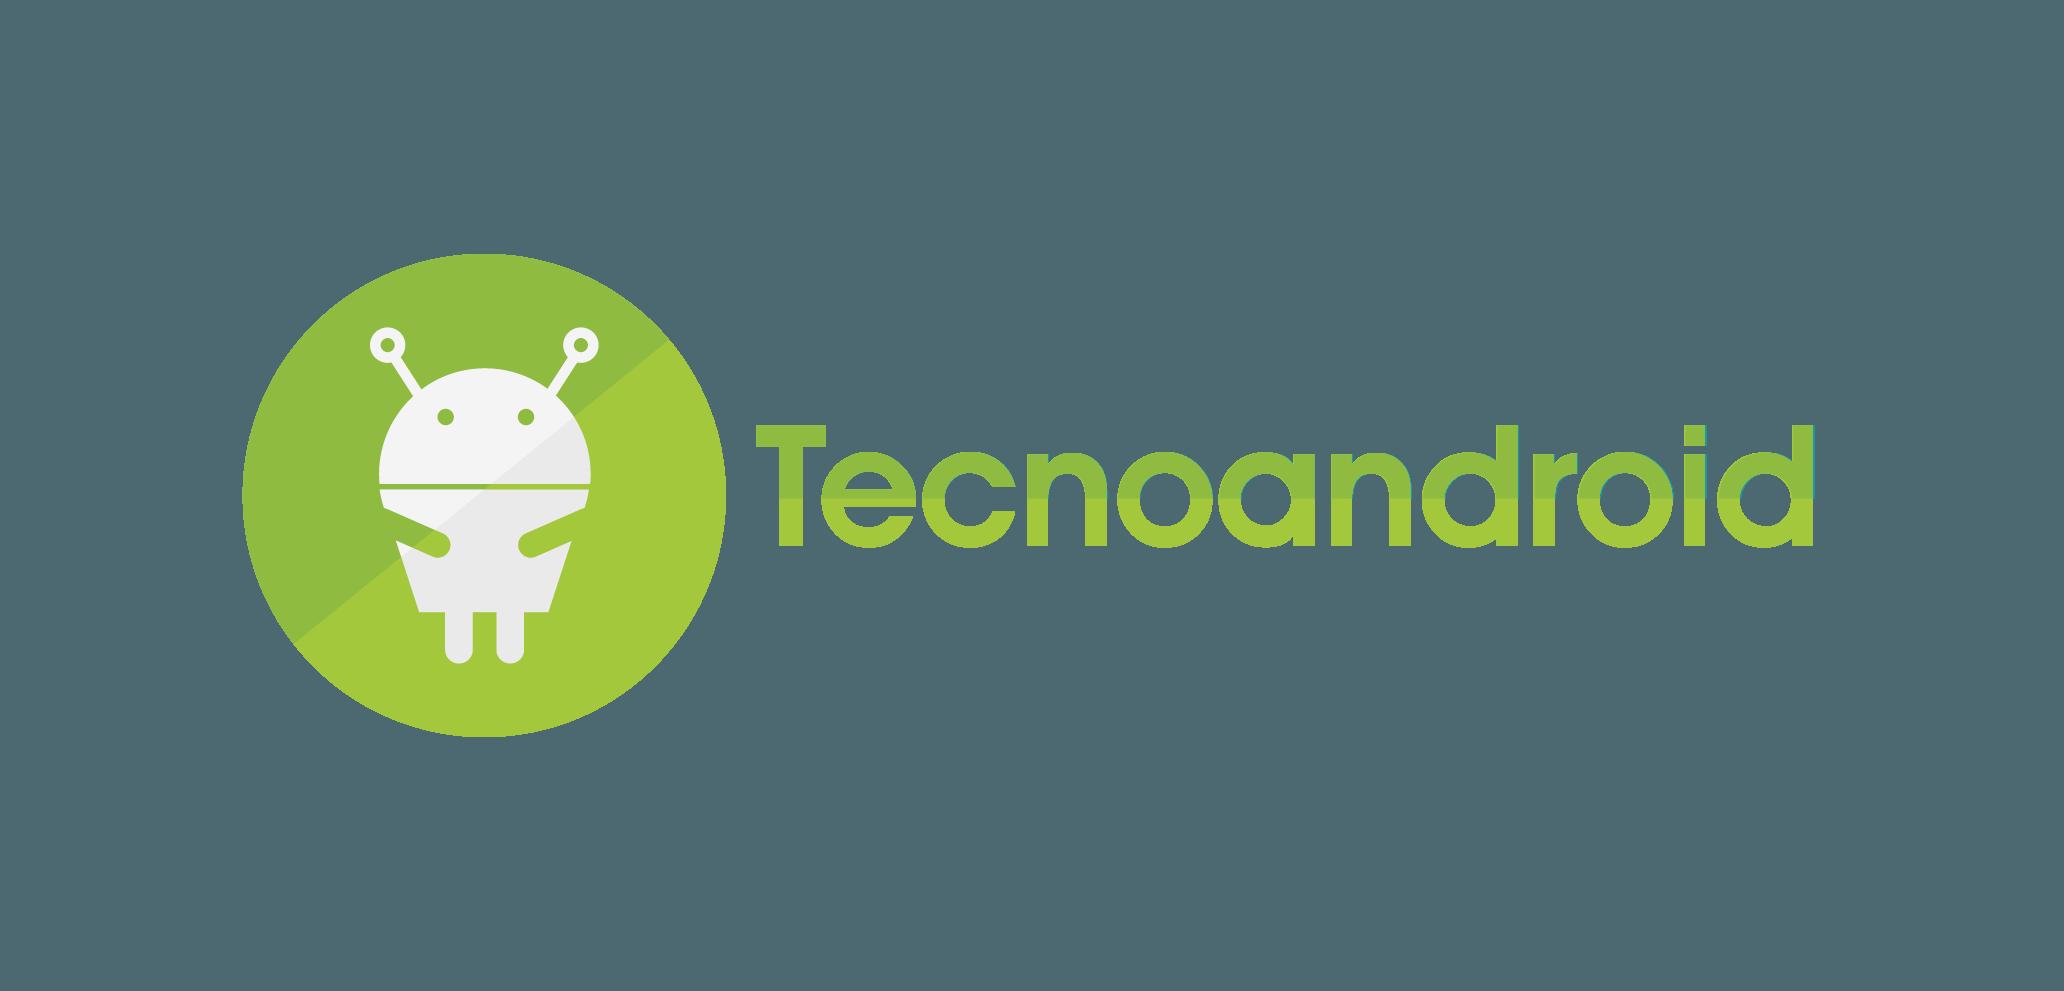 tecnoandroid